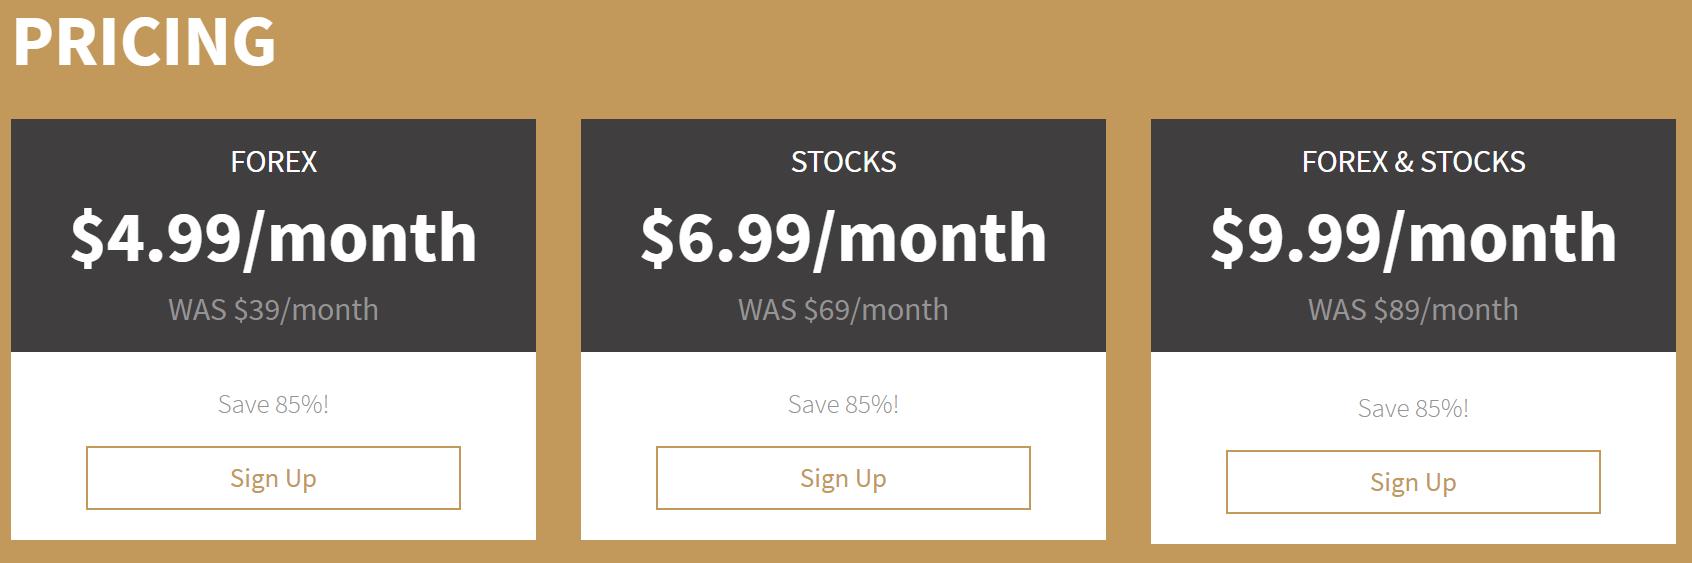 Castles FX Pricing